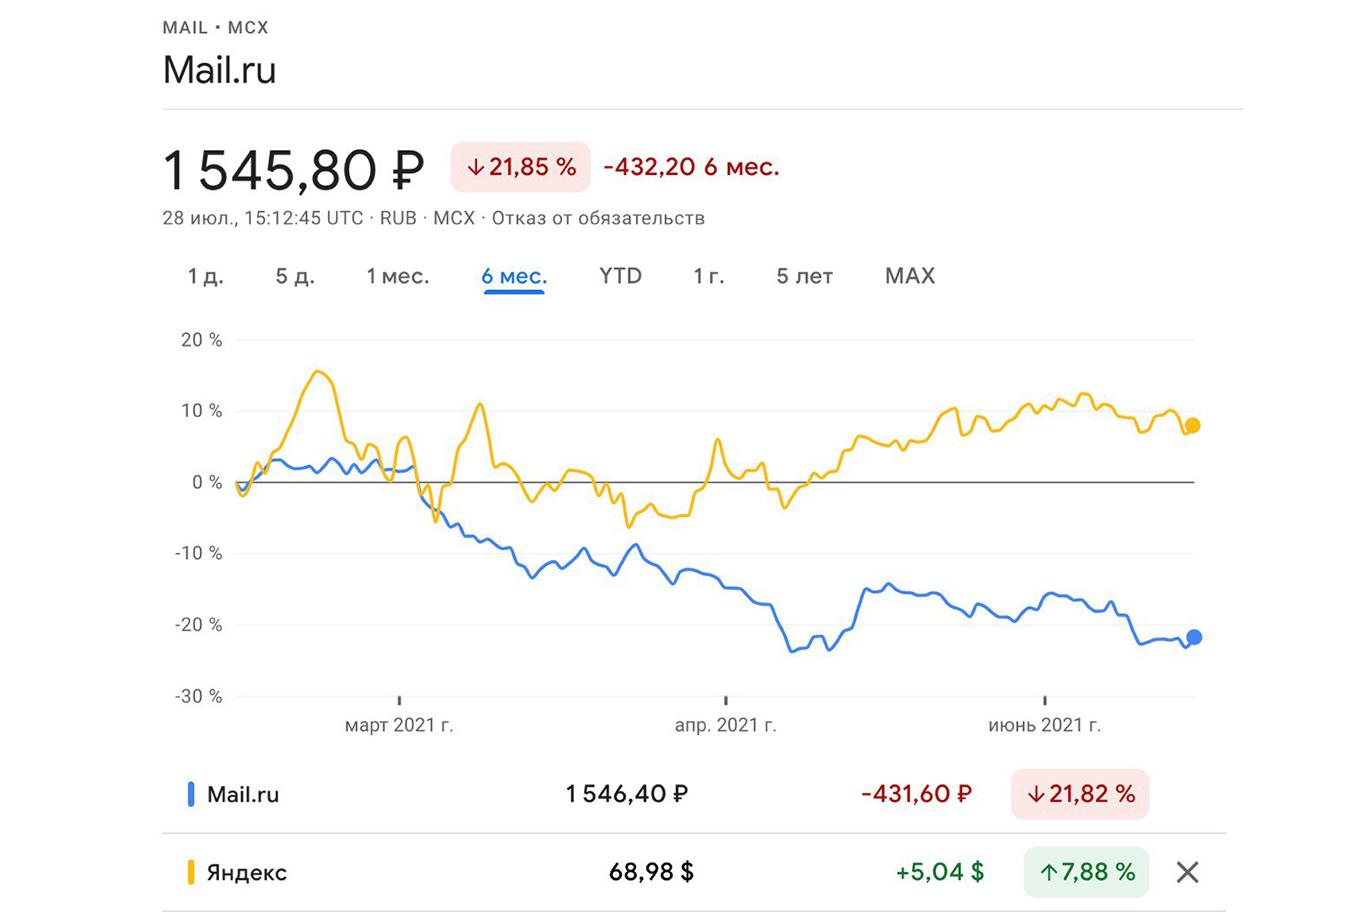 Mail.ru плюс 126%: есть ли надежда?